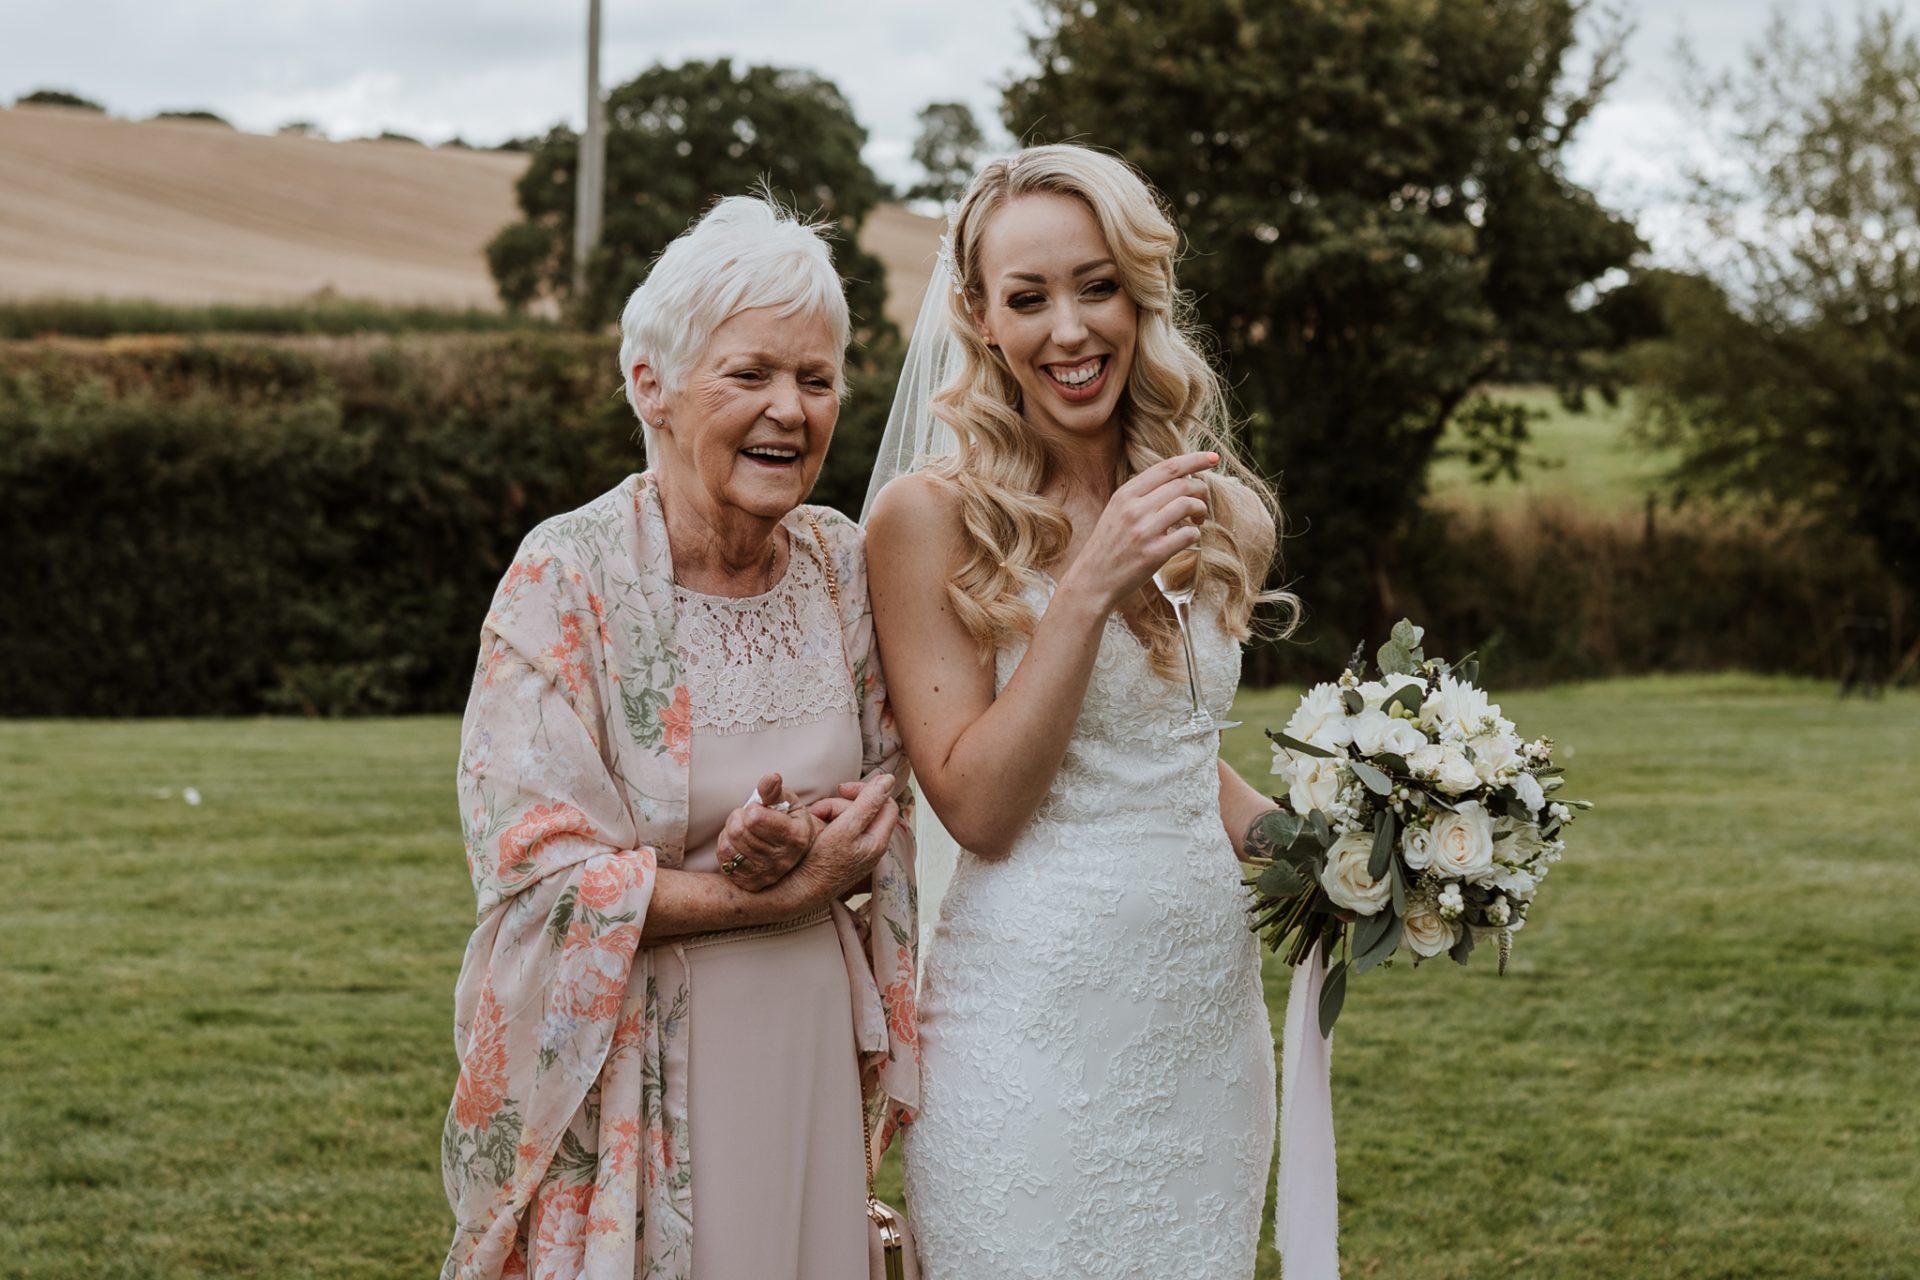 bride & grandma laughing natural photo